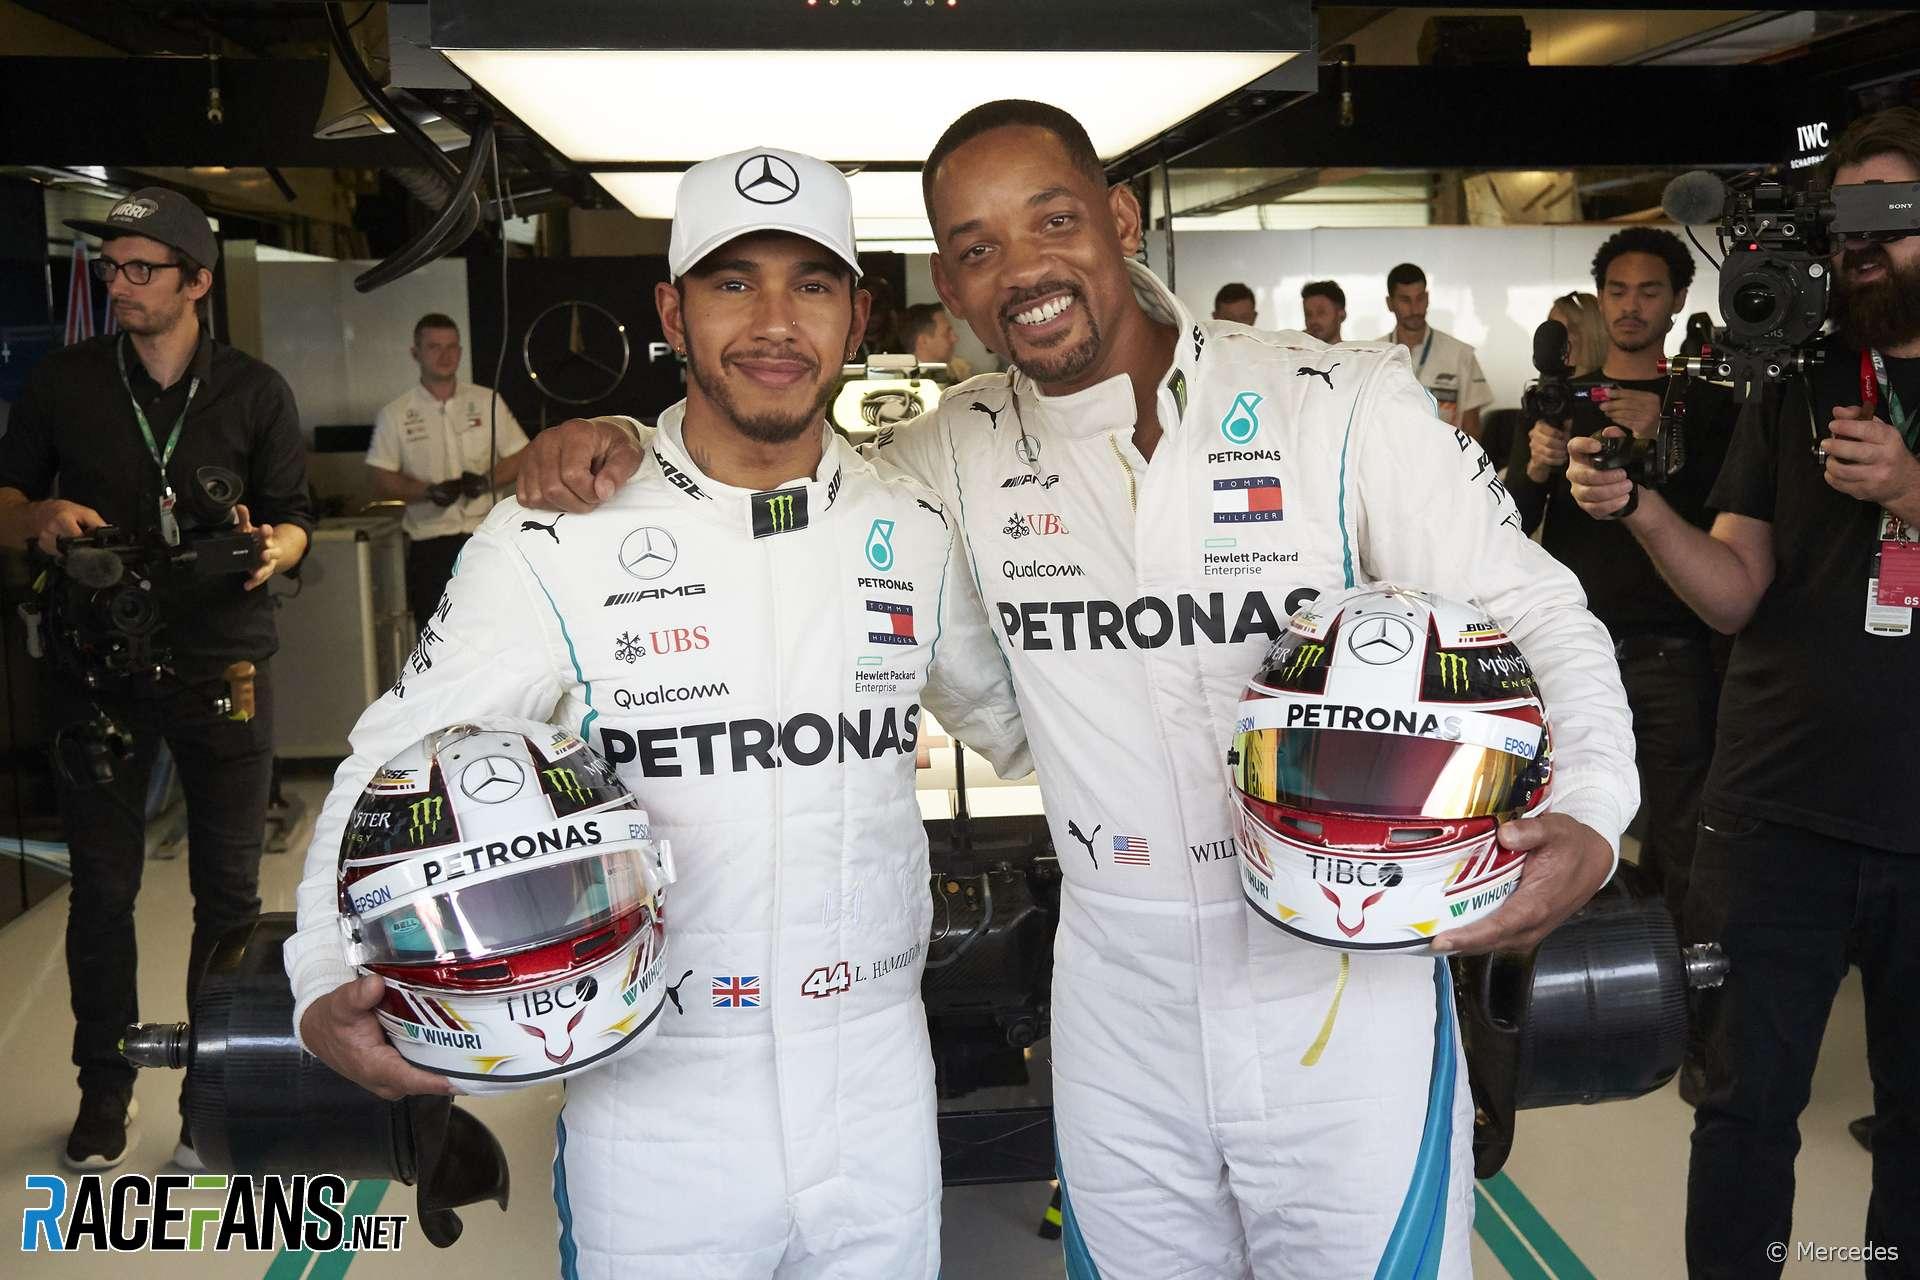 Lewis Hamilton, Will Smith, Yas Marina, 2018